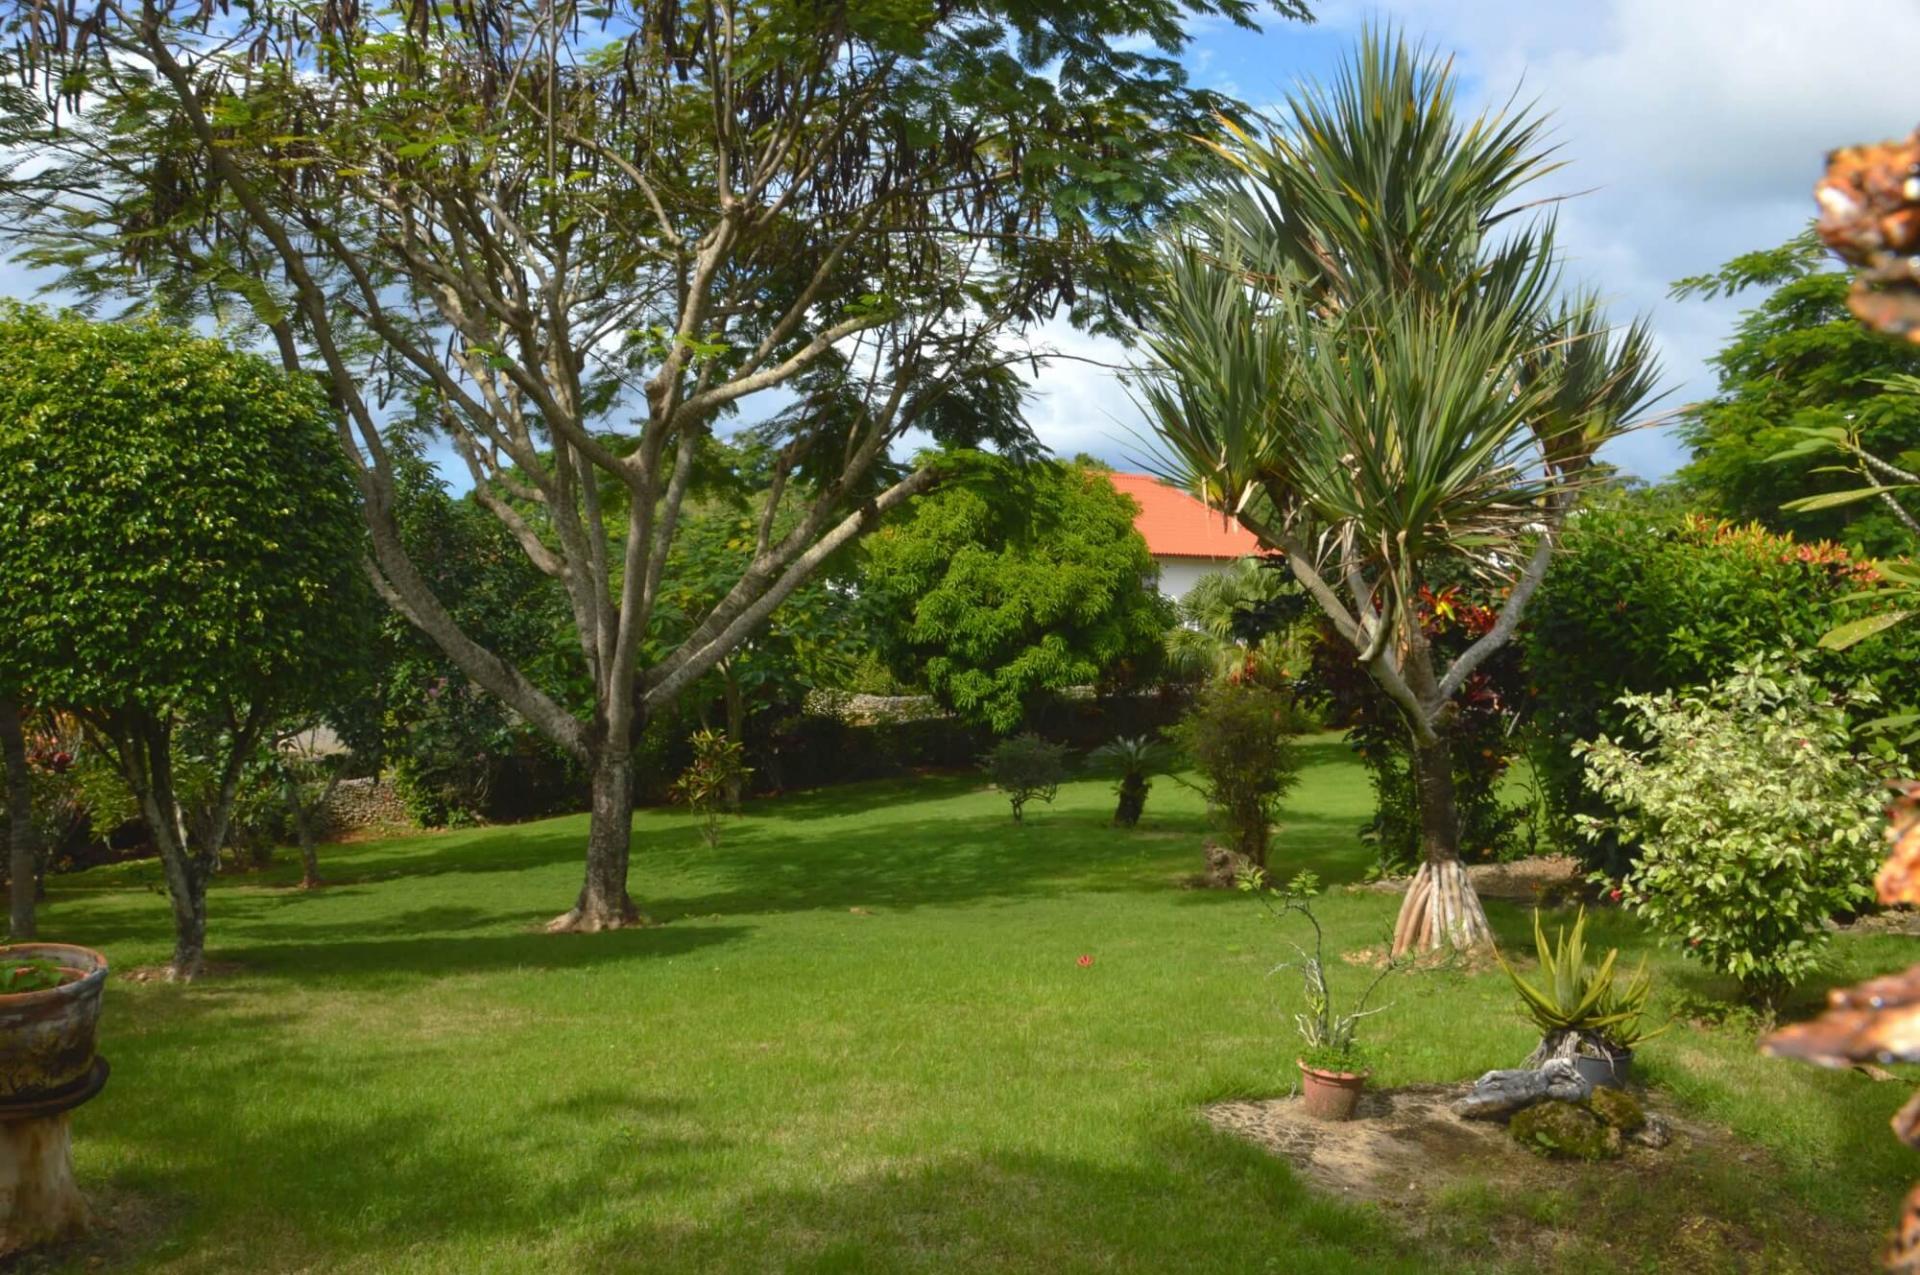 Jardin piscine rio san juan 1